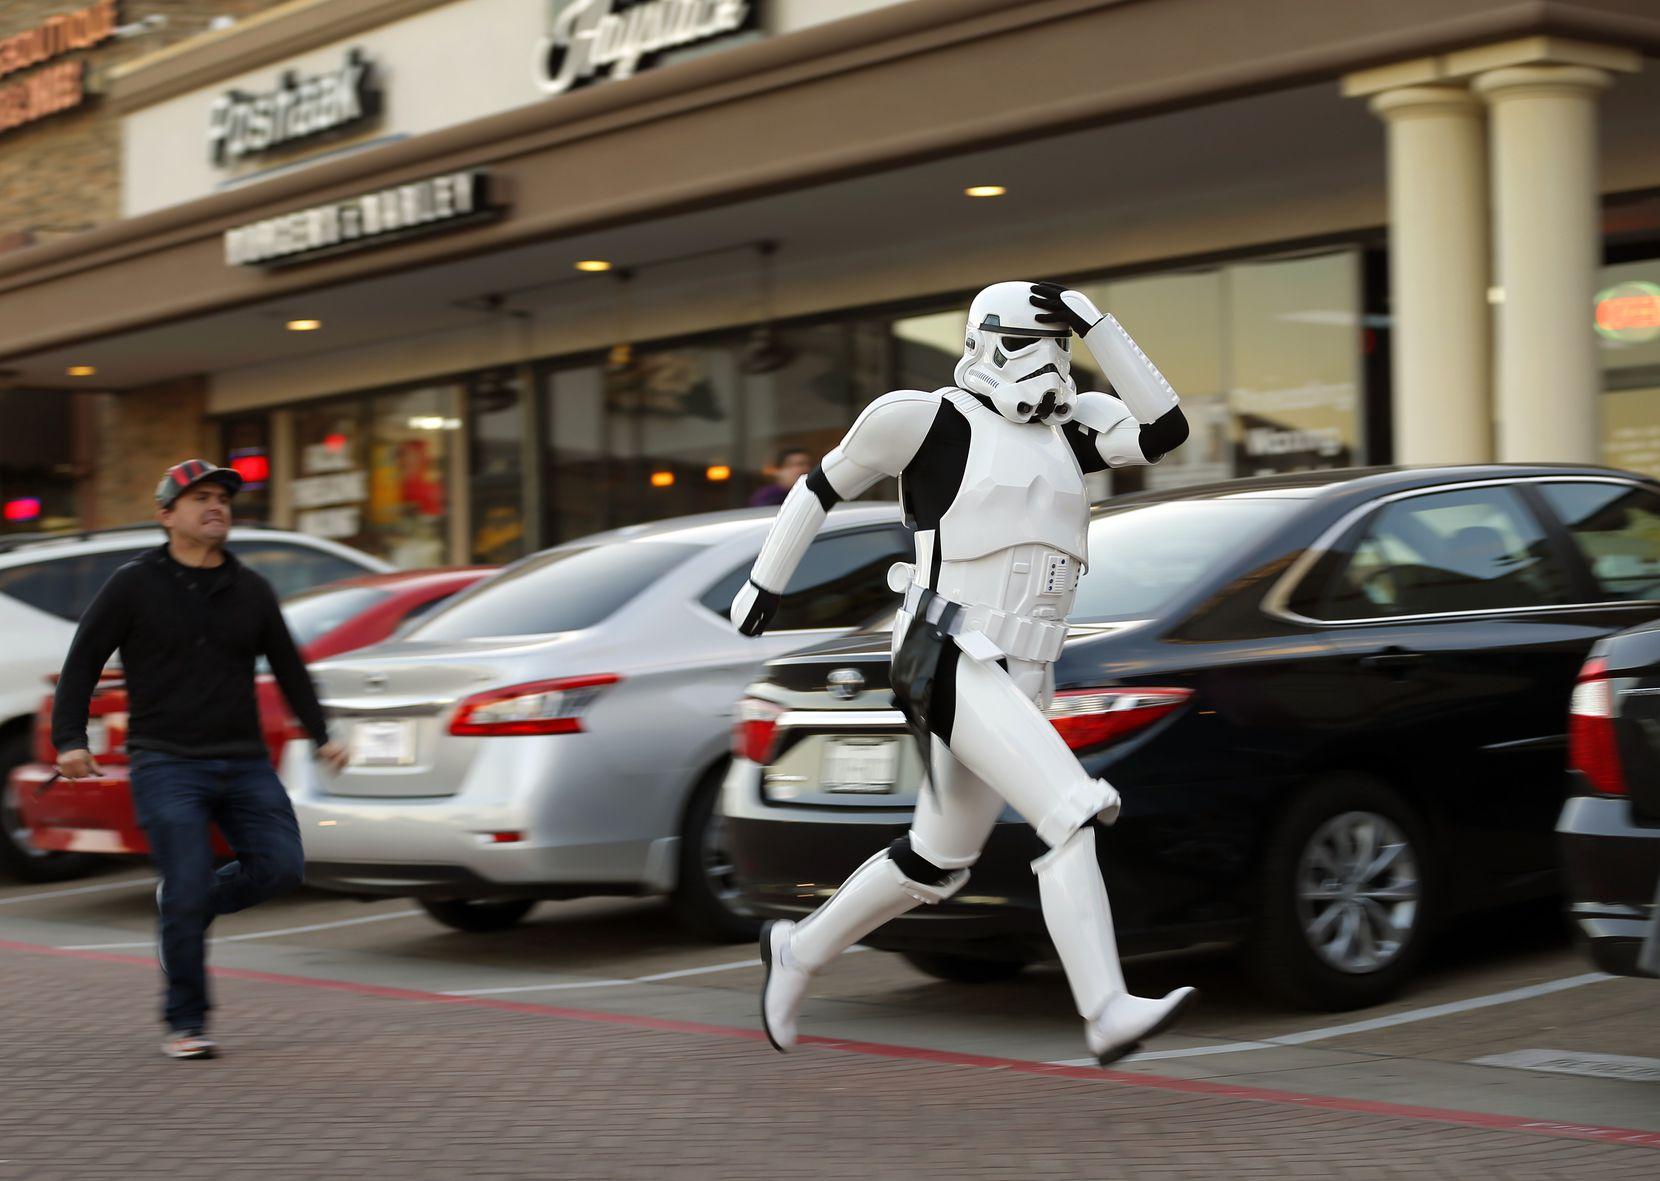 Dos aficionados de Star Wars corriendo afuera del Alamo Draft House en Richardson, Texas. (Tom Fox/DMN)